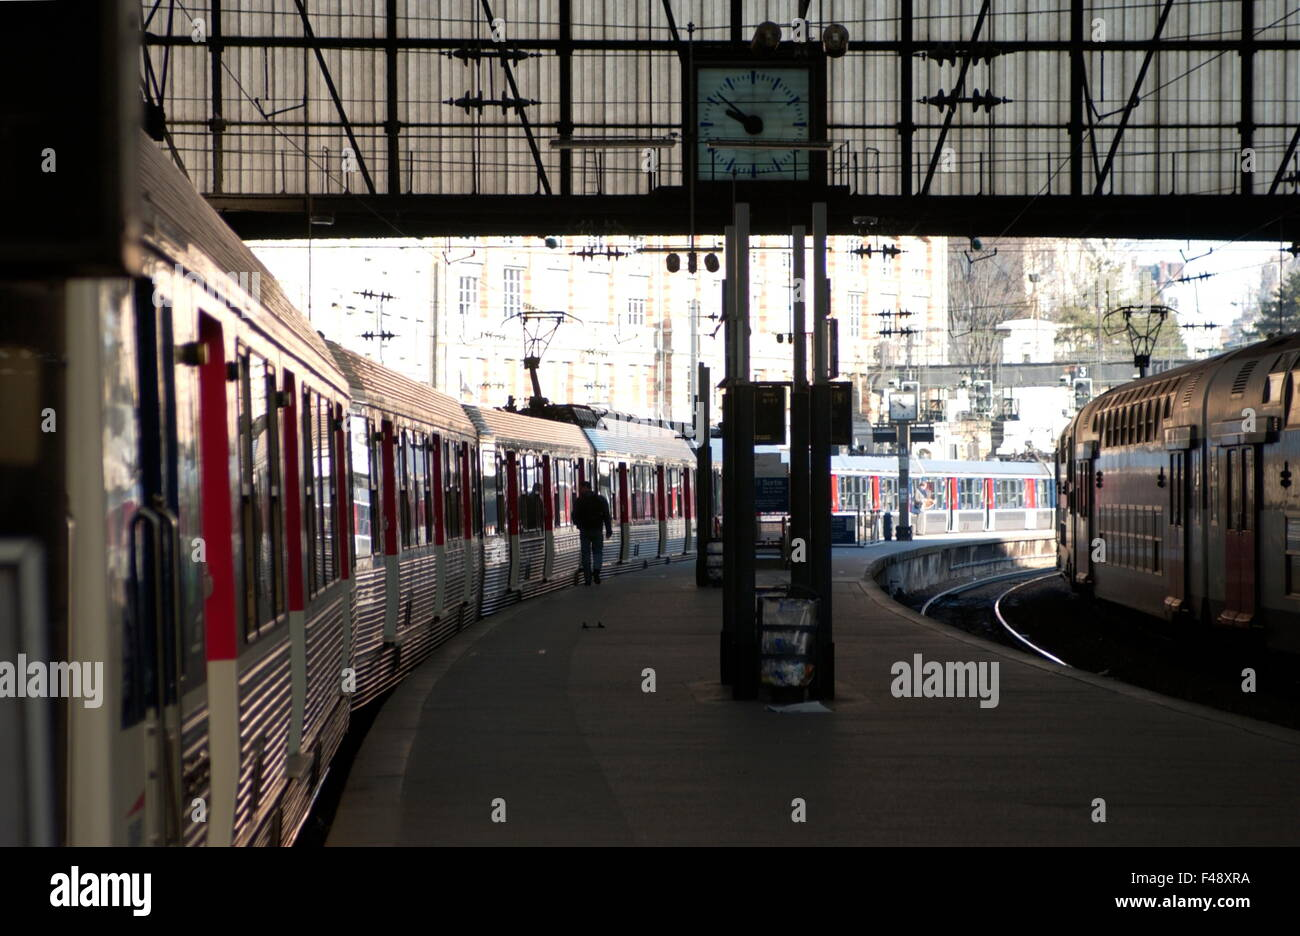 The Gare St Lazare Stock Photos Amp The Gare St Lazare Stock